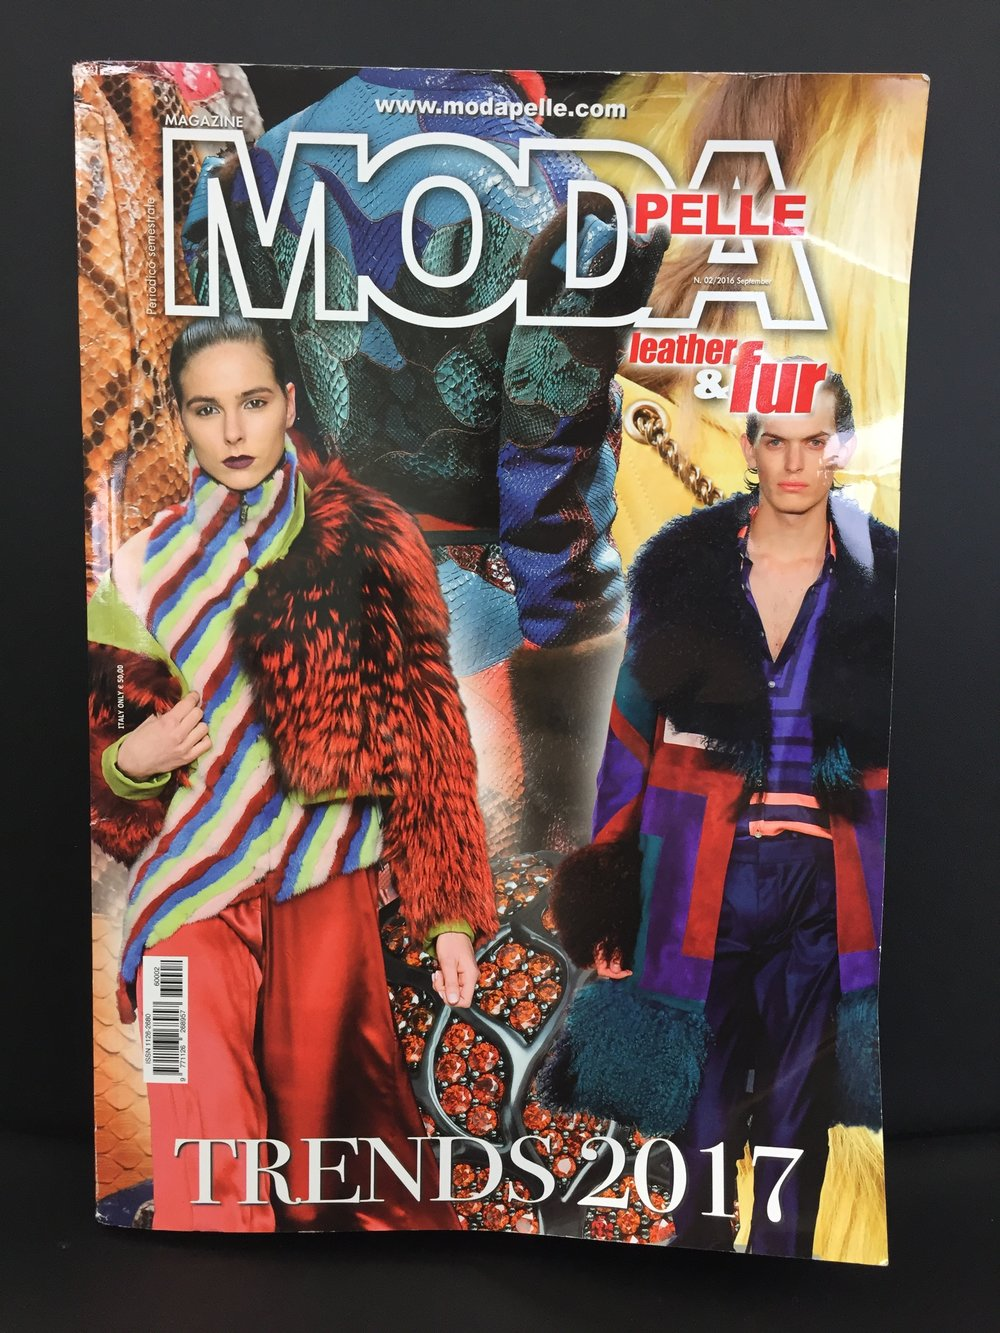 As seen in Always Looking Ahead ILOE Moda Pelle No.2 September 2016